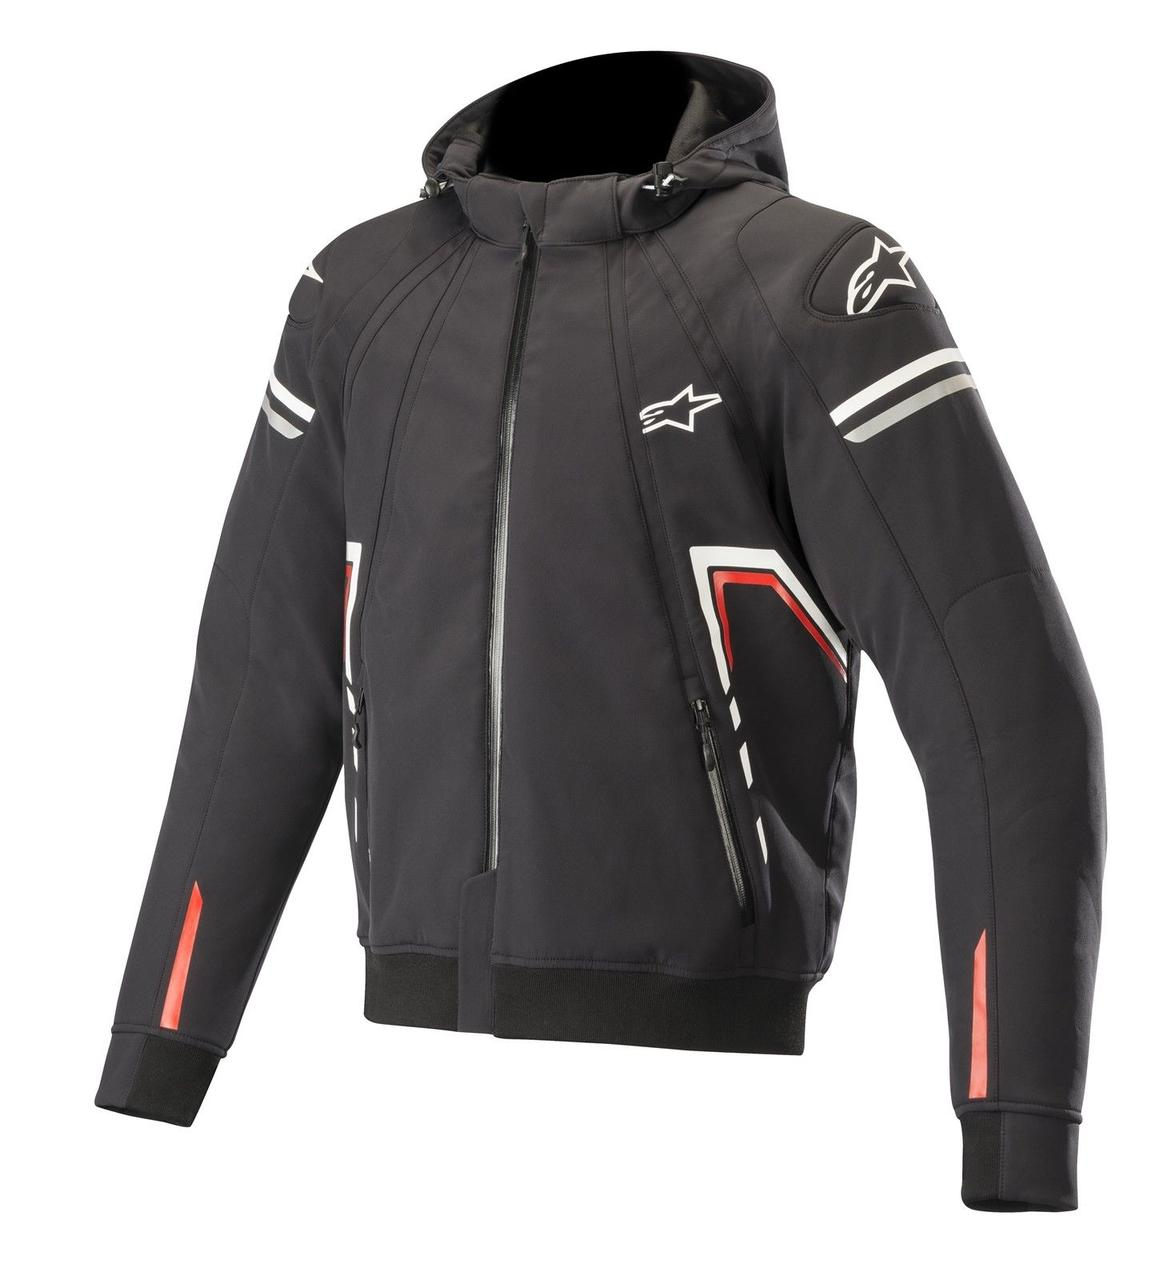 Мотокуртка ALPINESTARS SEKTOR TECH black white red